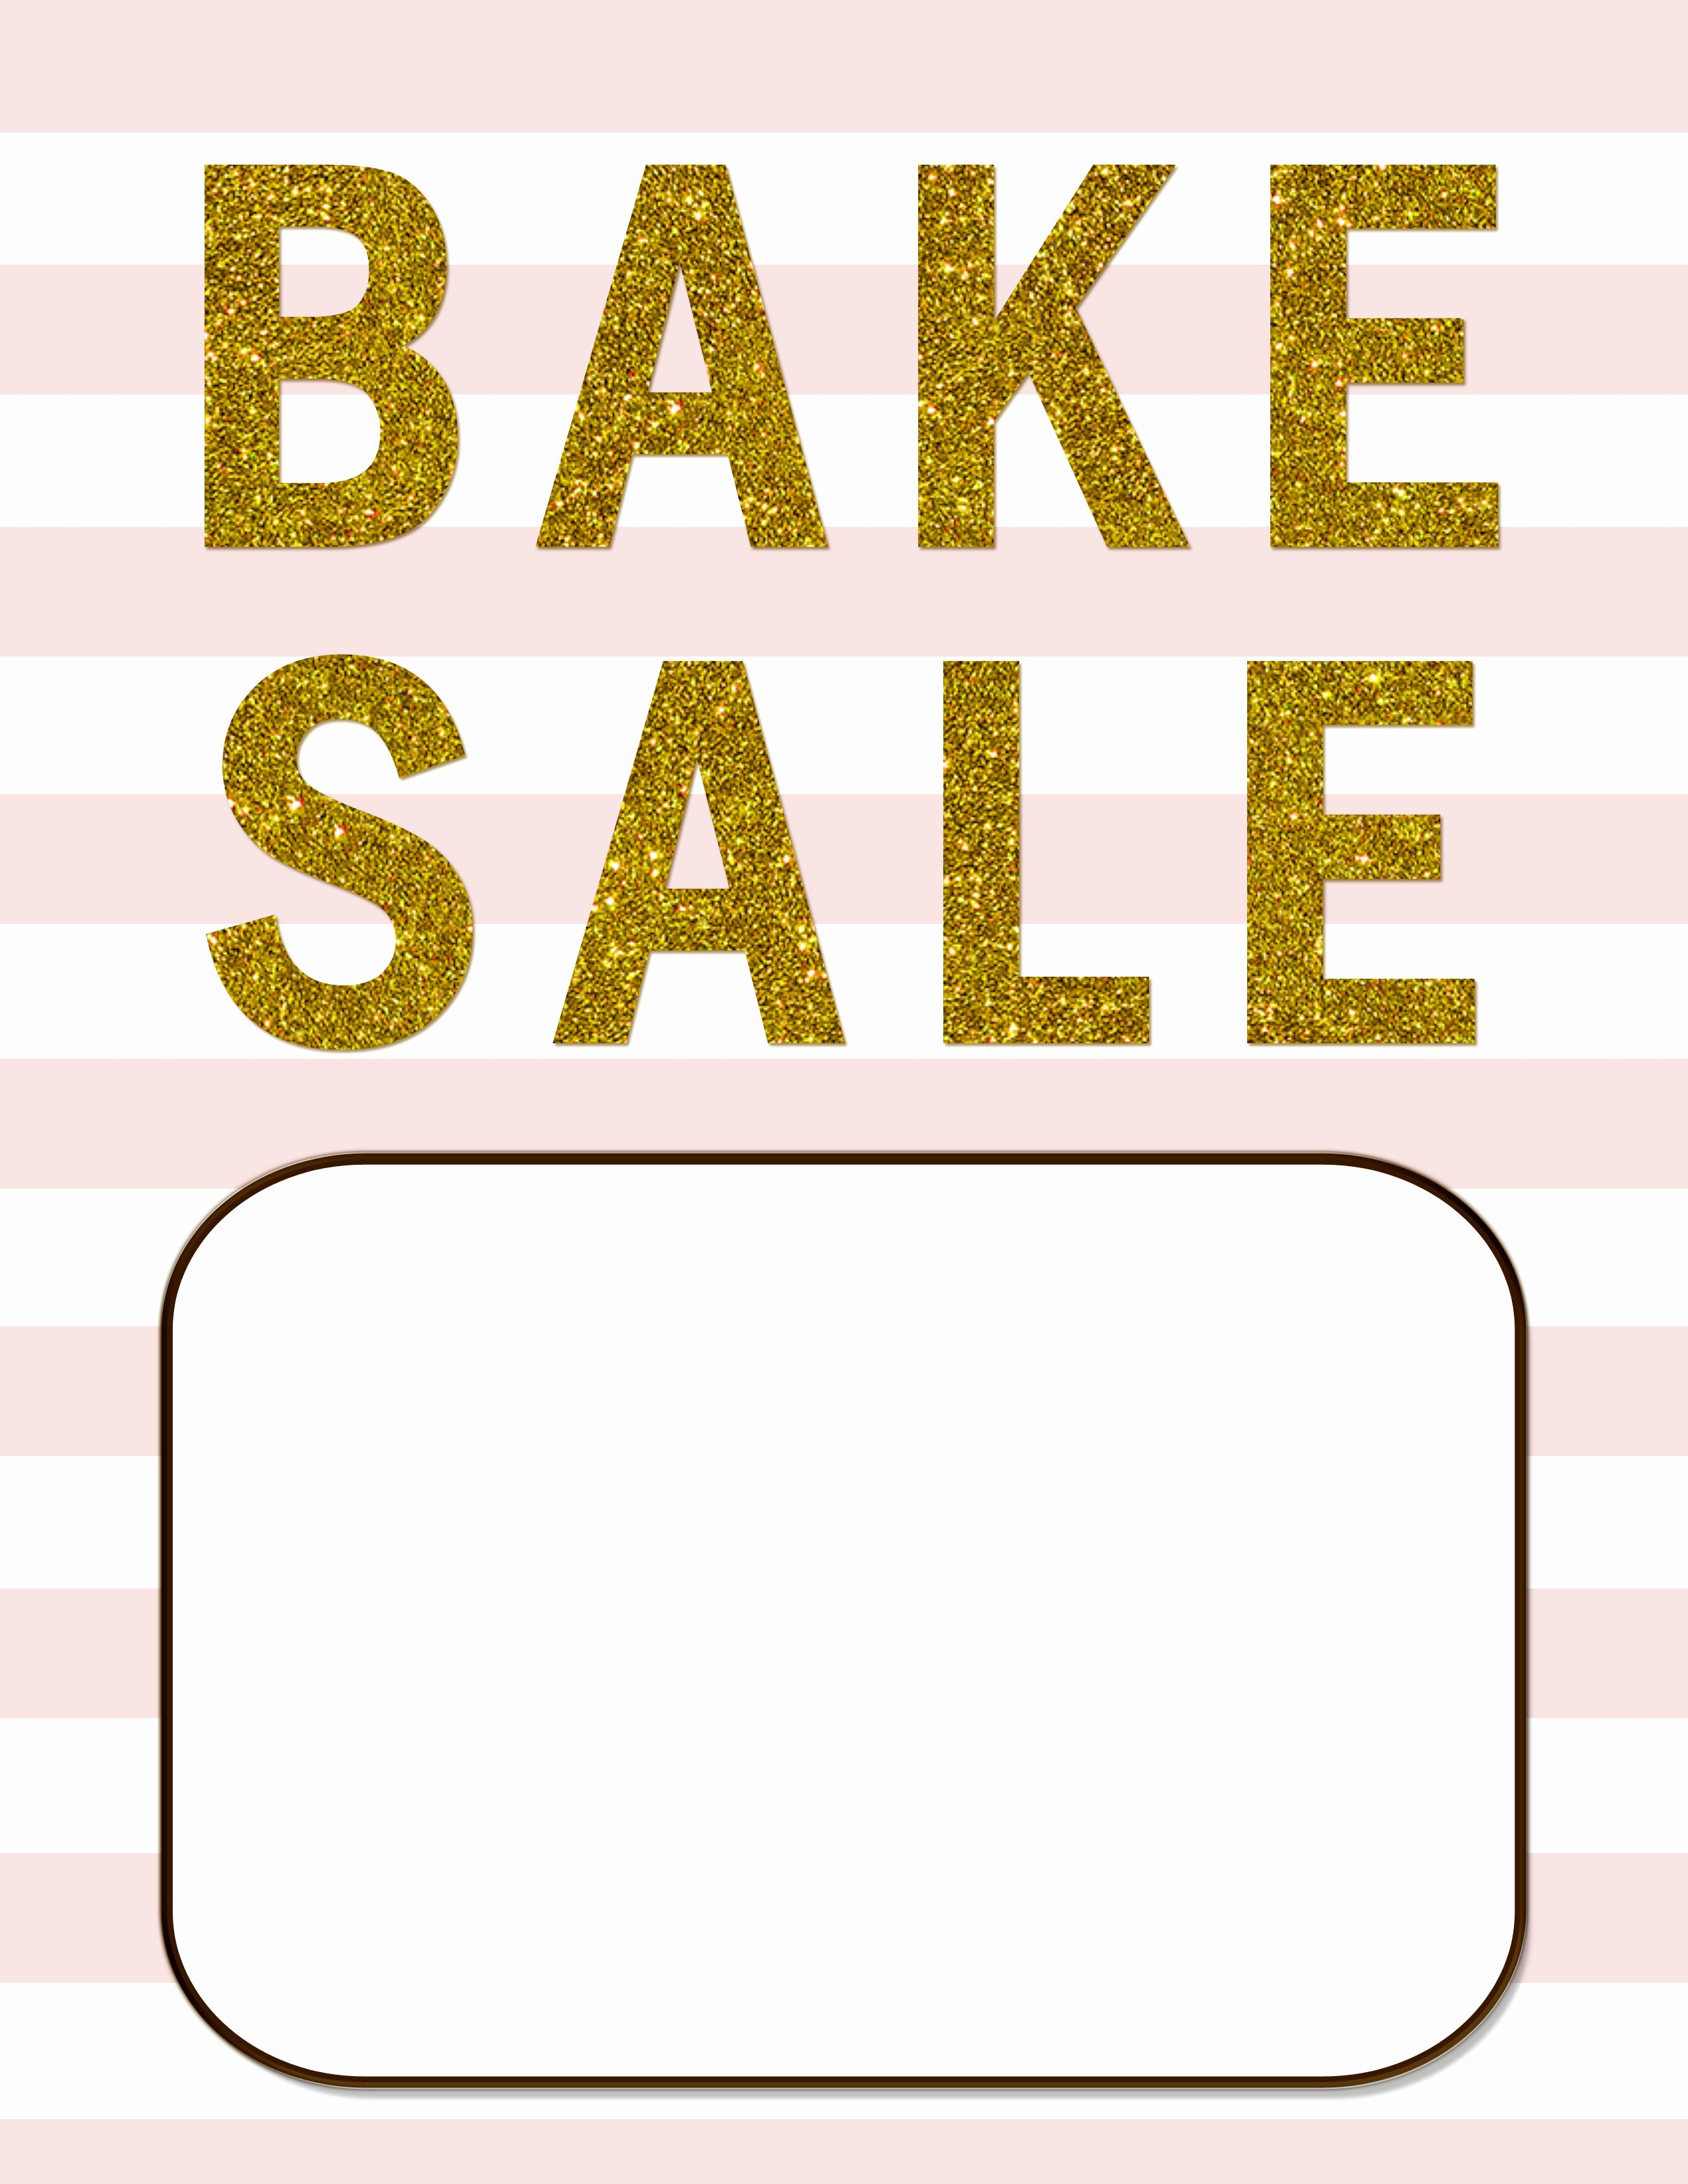 Bake Sale Flyer Ideas Elegant Bake Sale Flyers – Free Flyer Designs